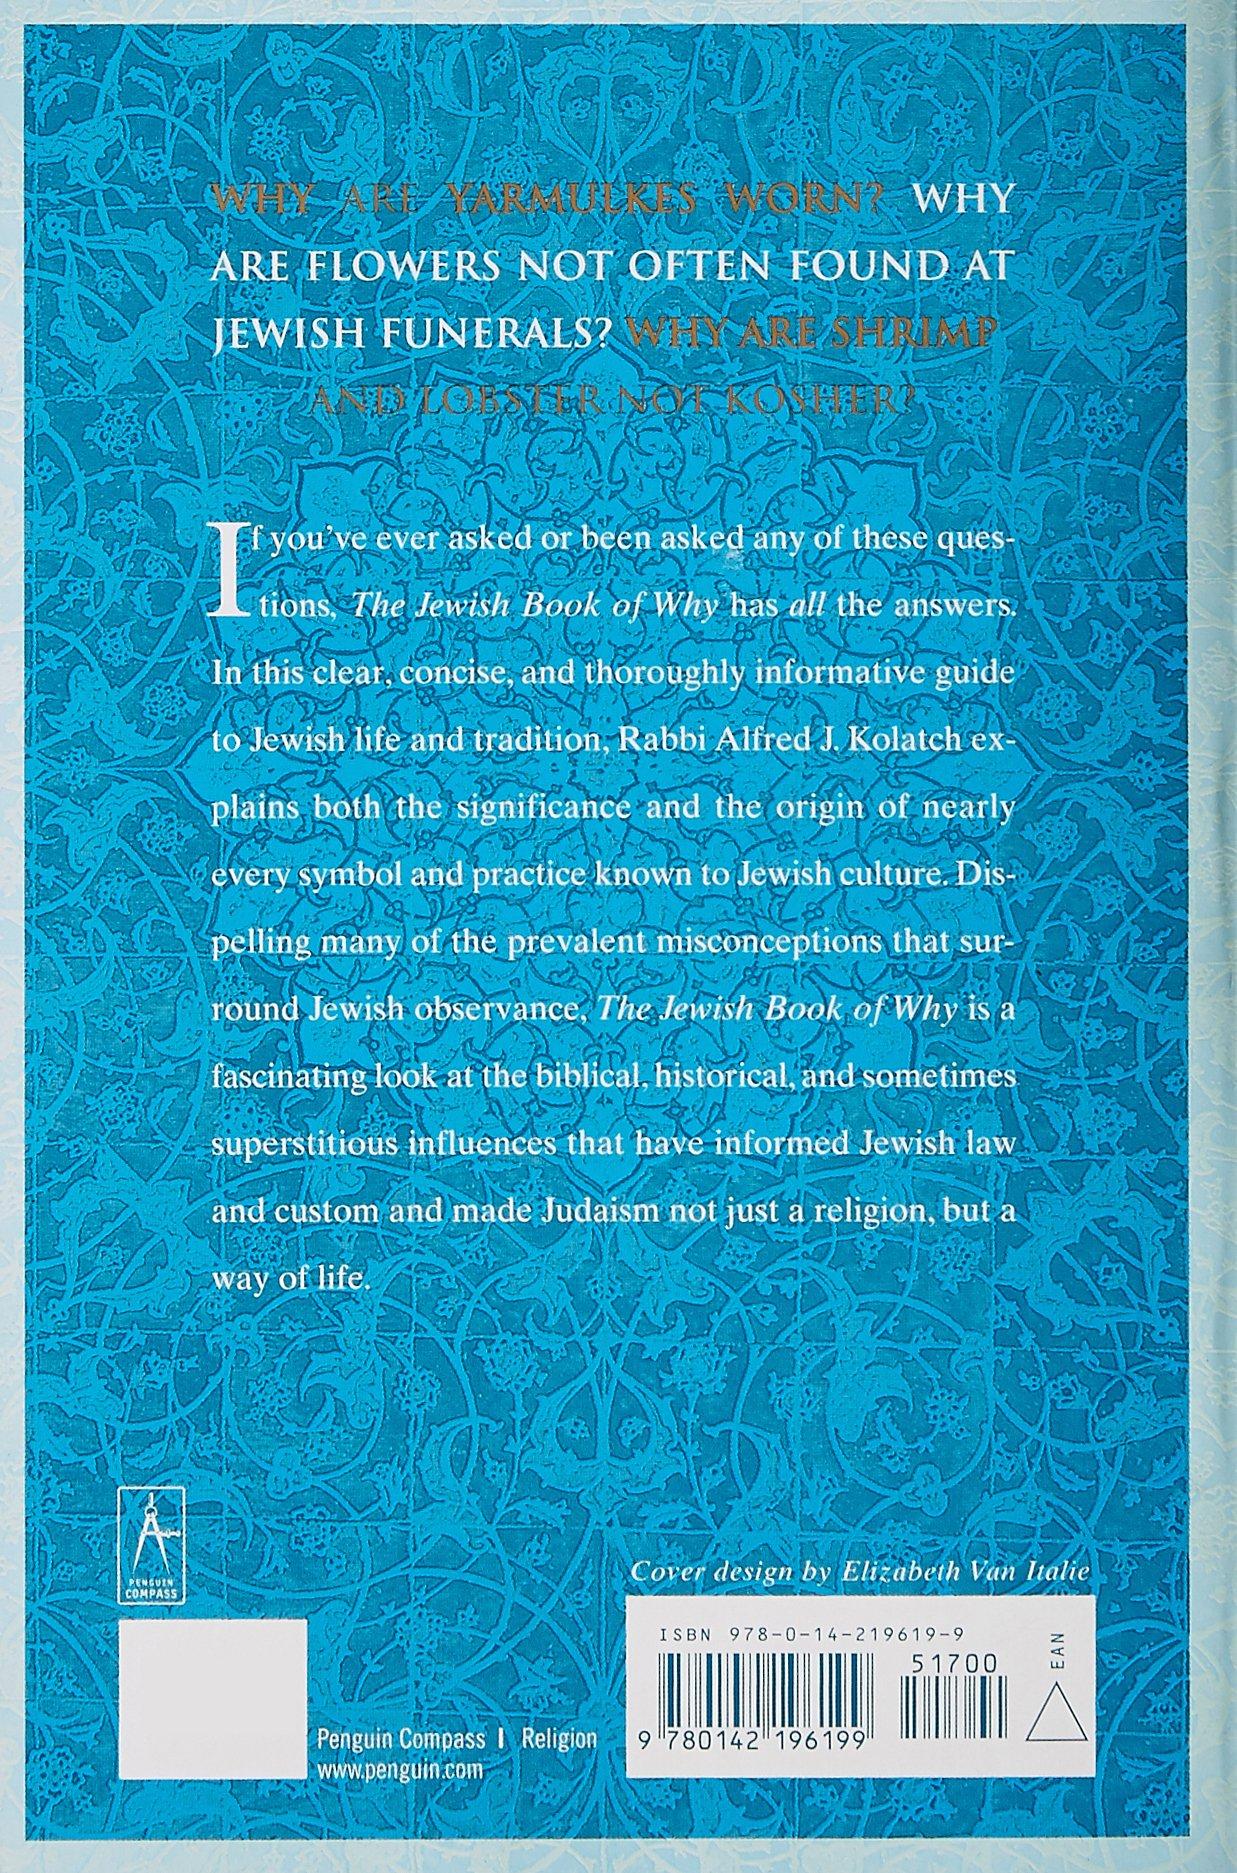 The Jewish Book of Why: Alfred J. Kolatch: 9780142196199: Amazon.com: Books